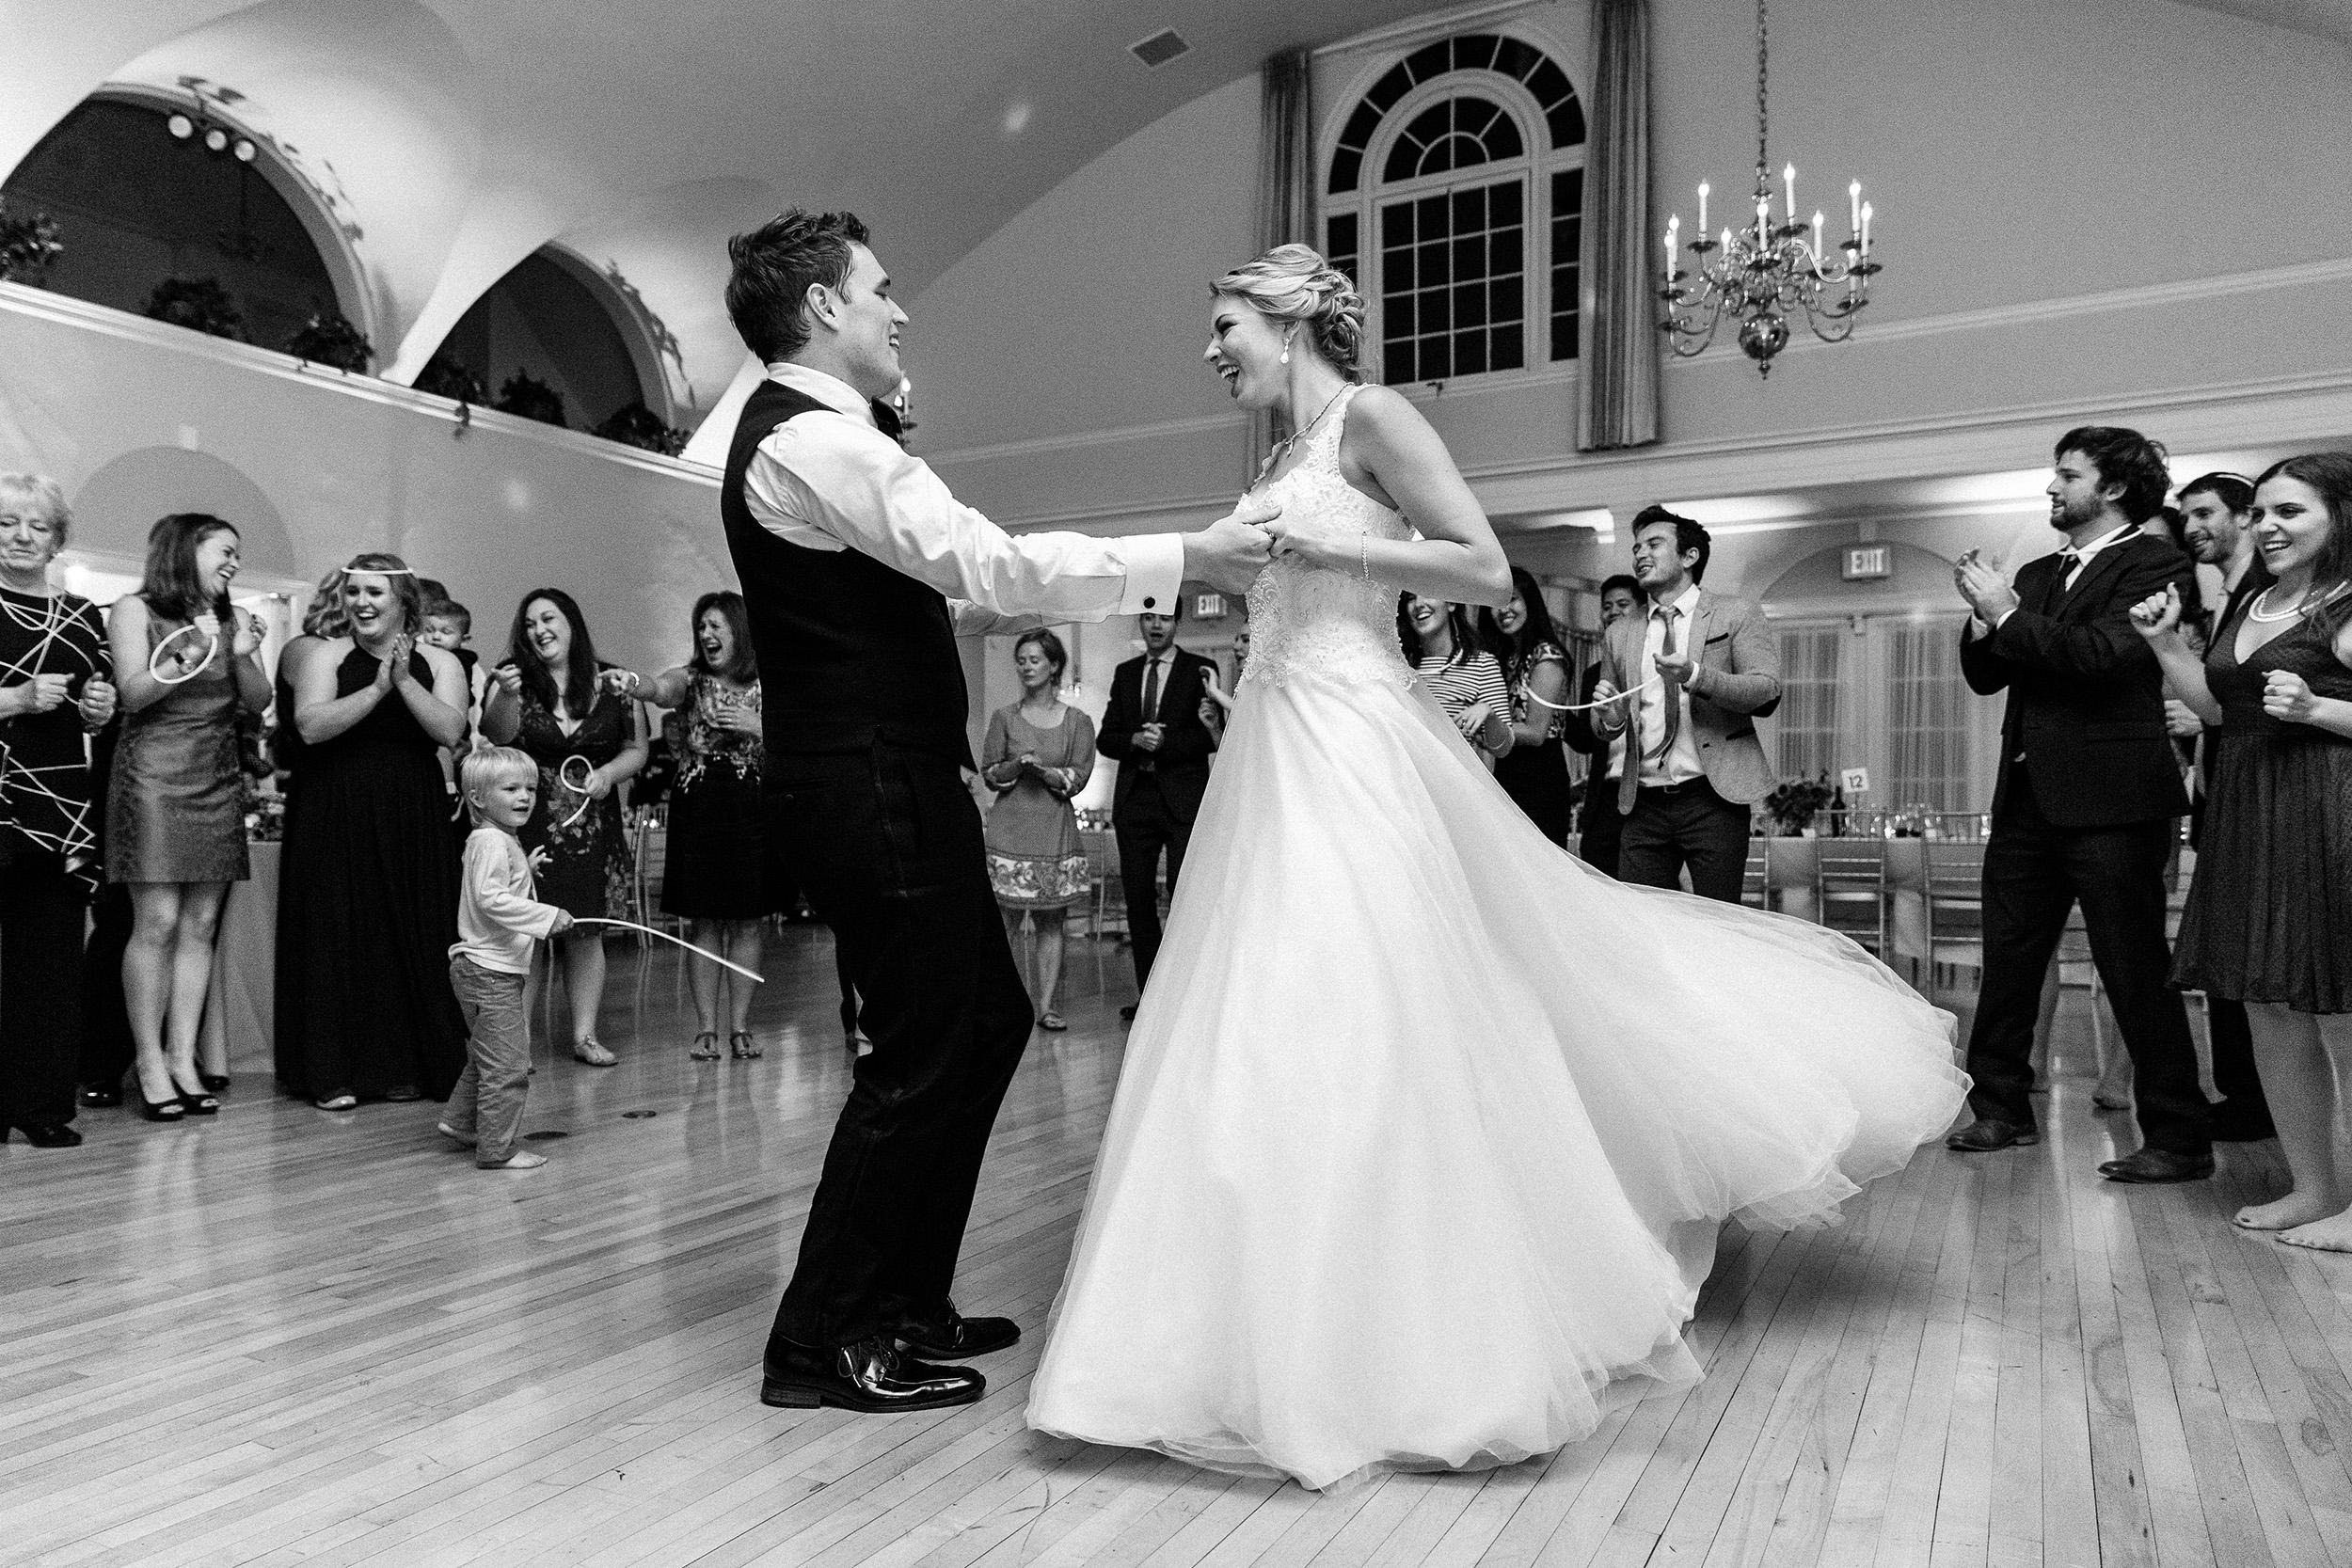 KarliCadel-Wedding-SeanTess-3064.jpg